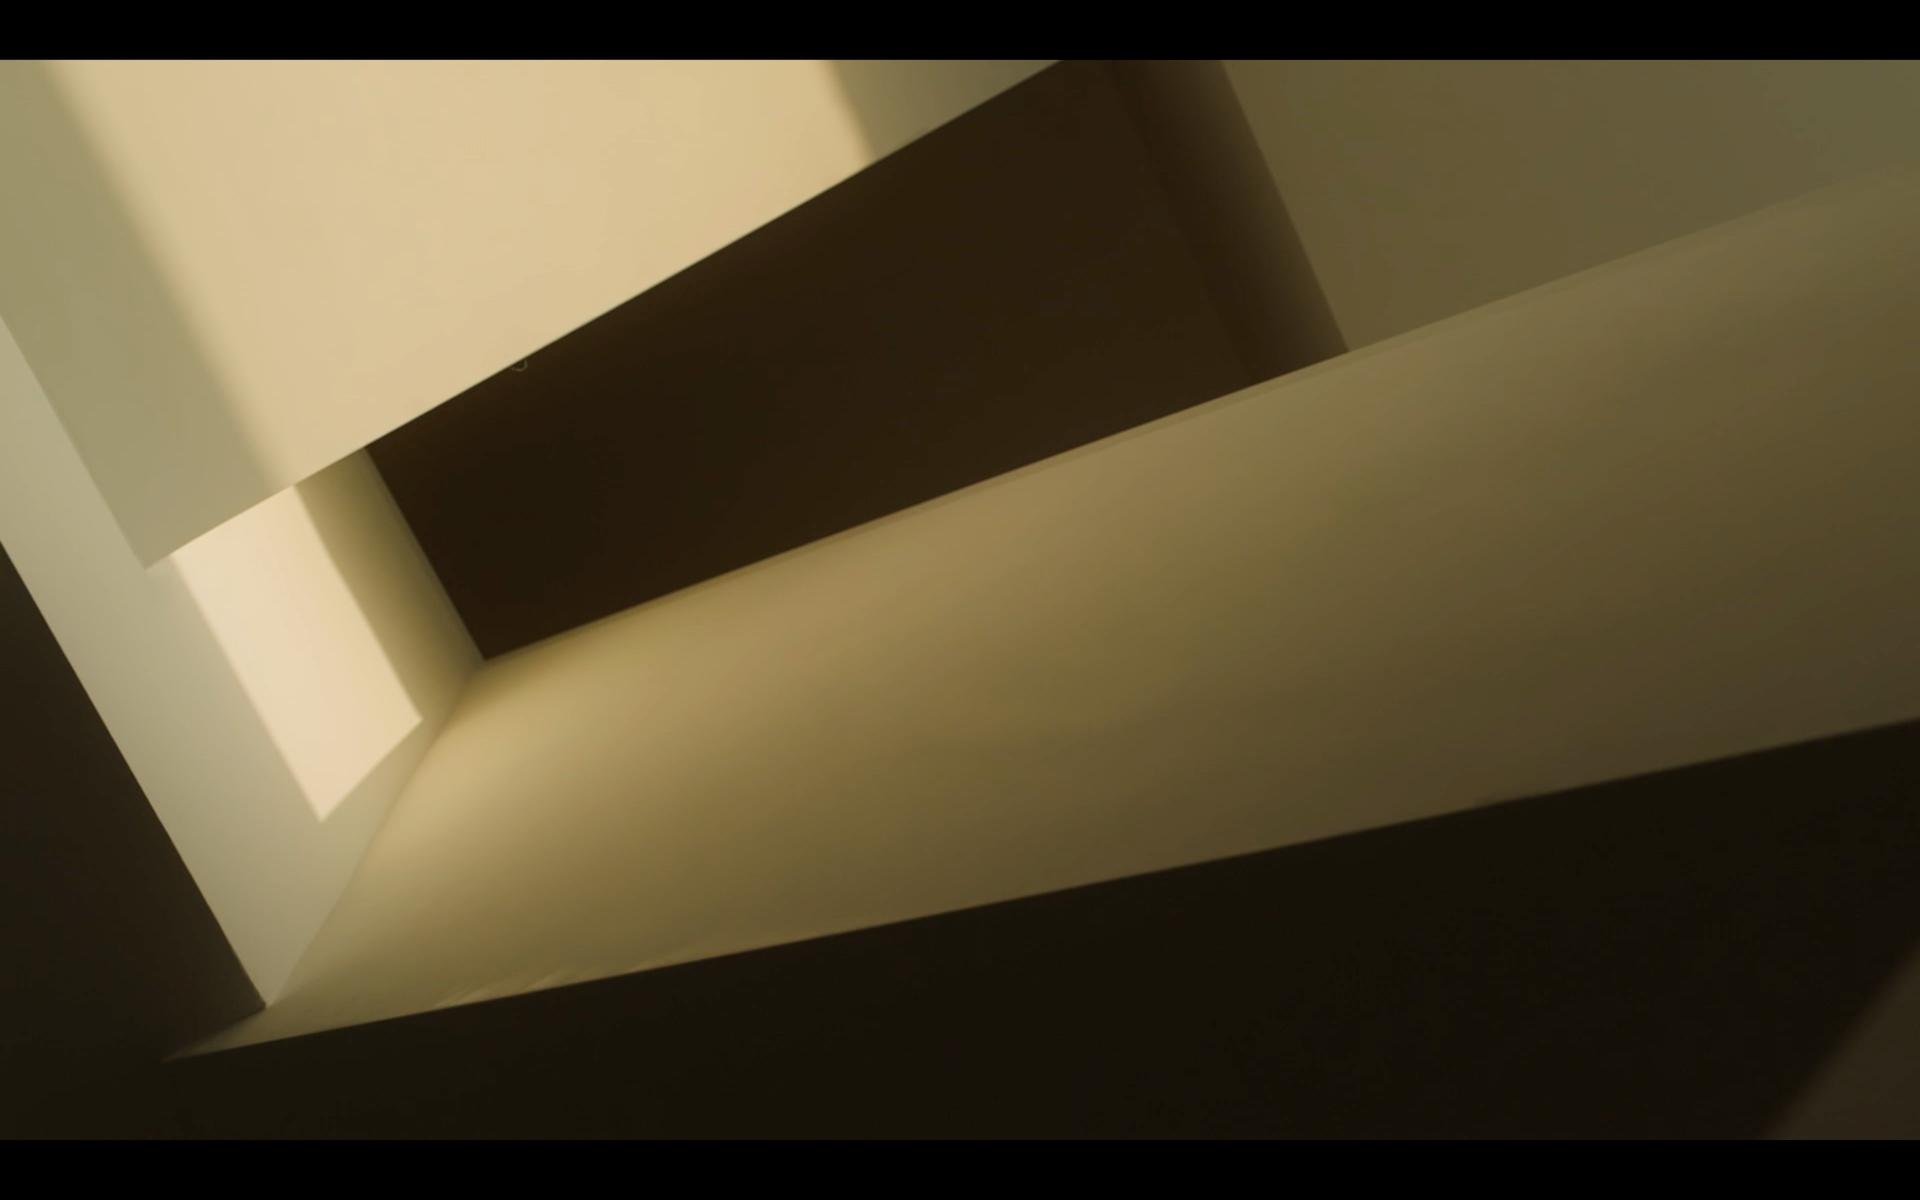 KYLE MACFADZEAN - Screenshot 2021-04-26 at 00.33.25